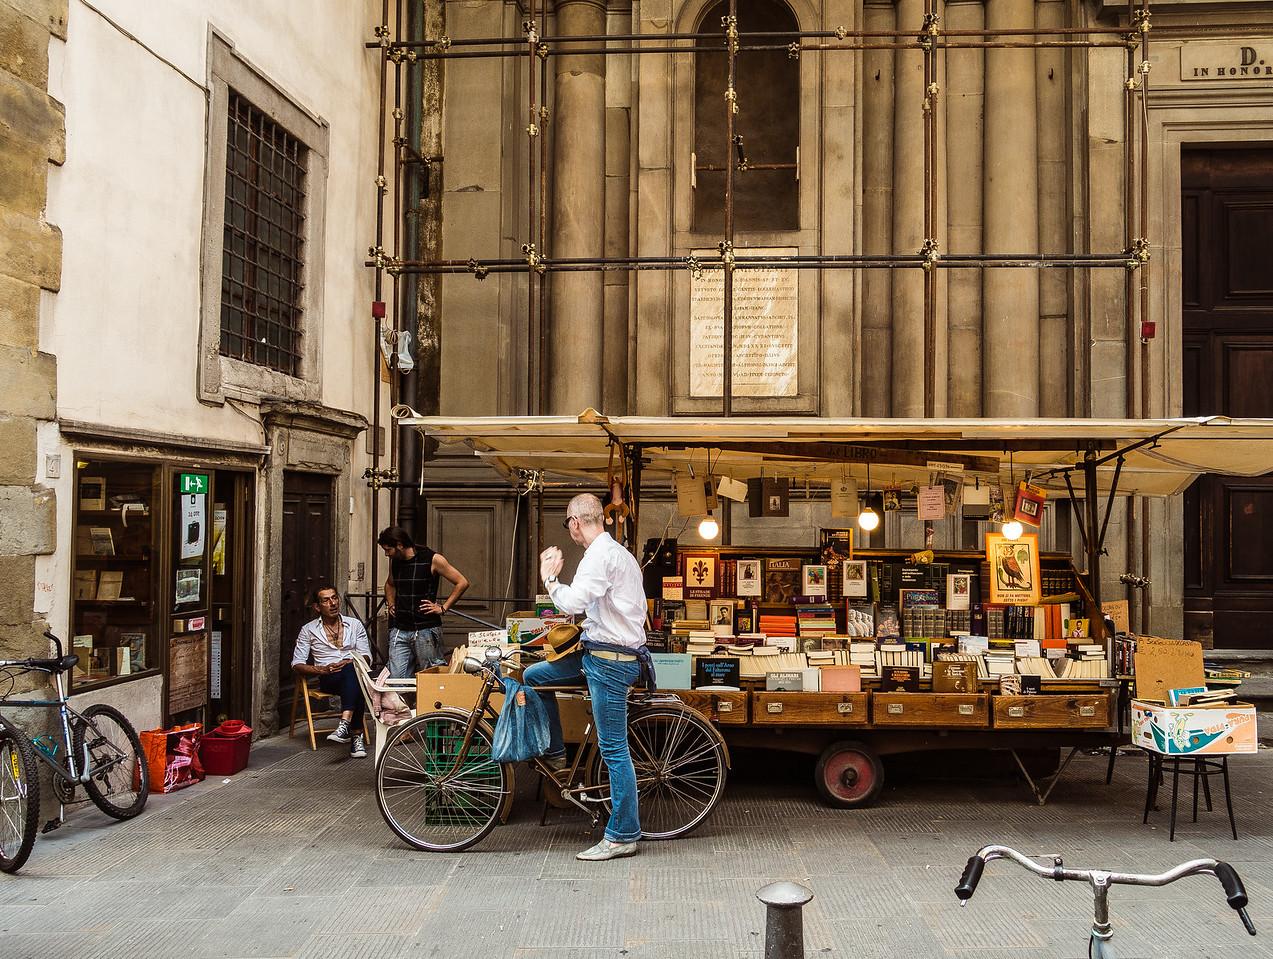 The perfect Italian street shot